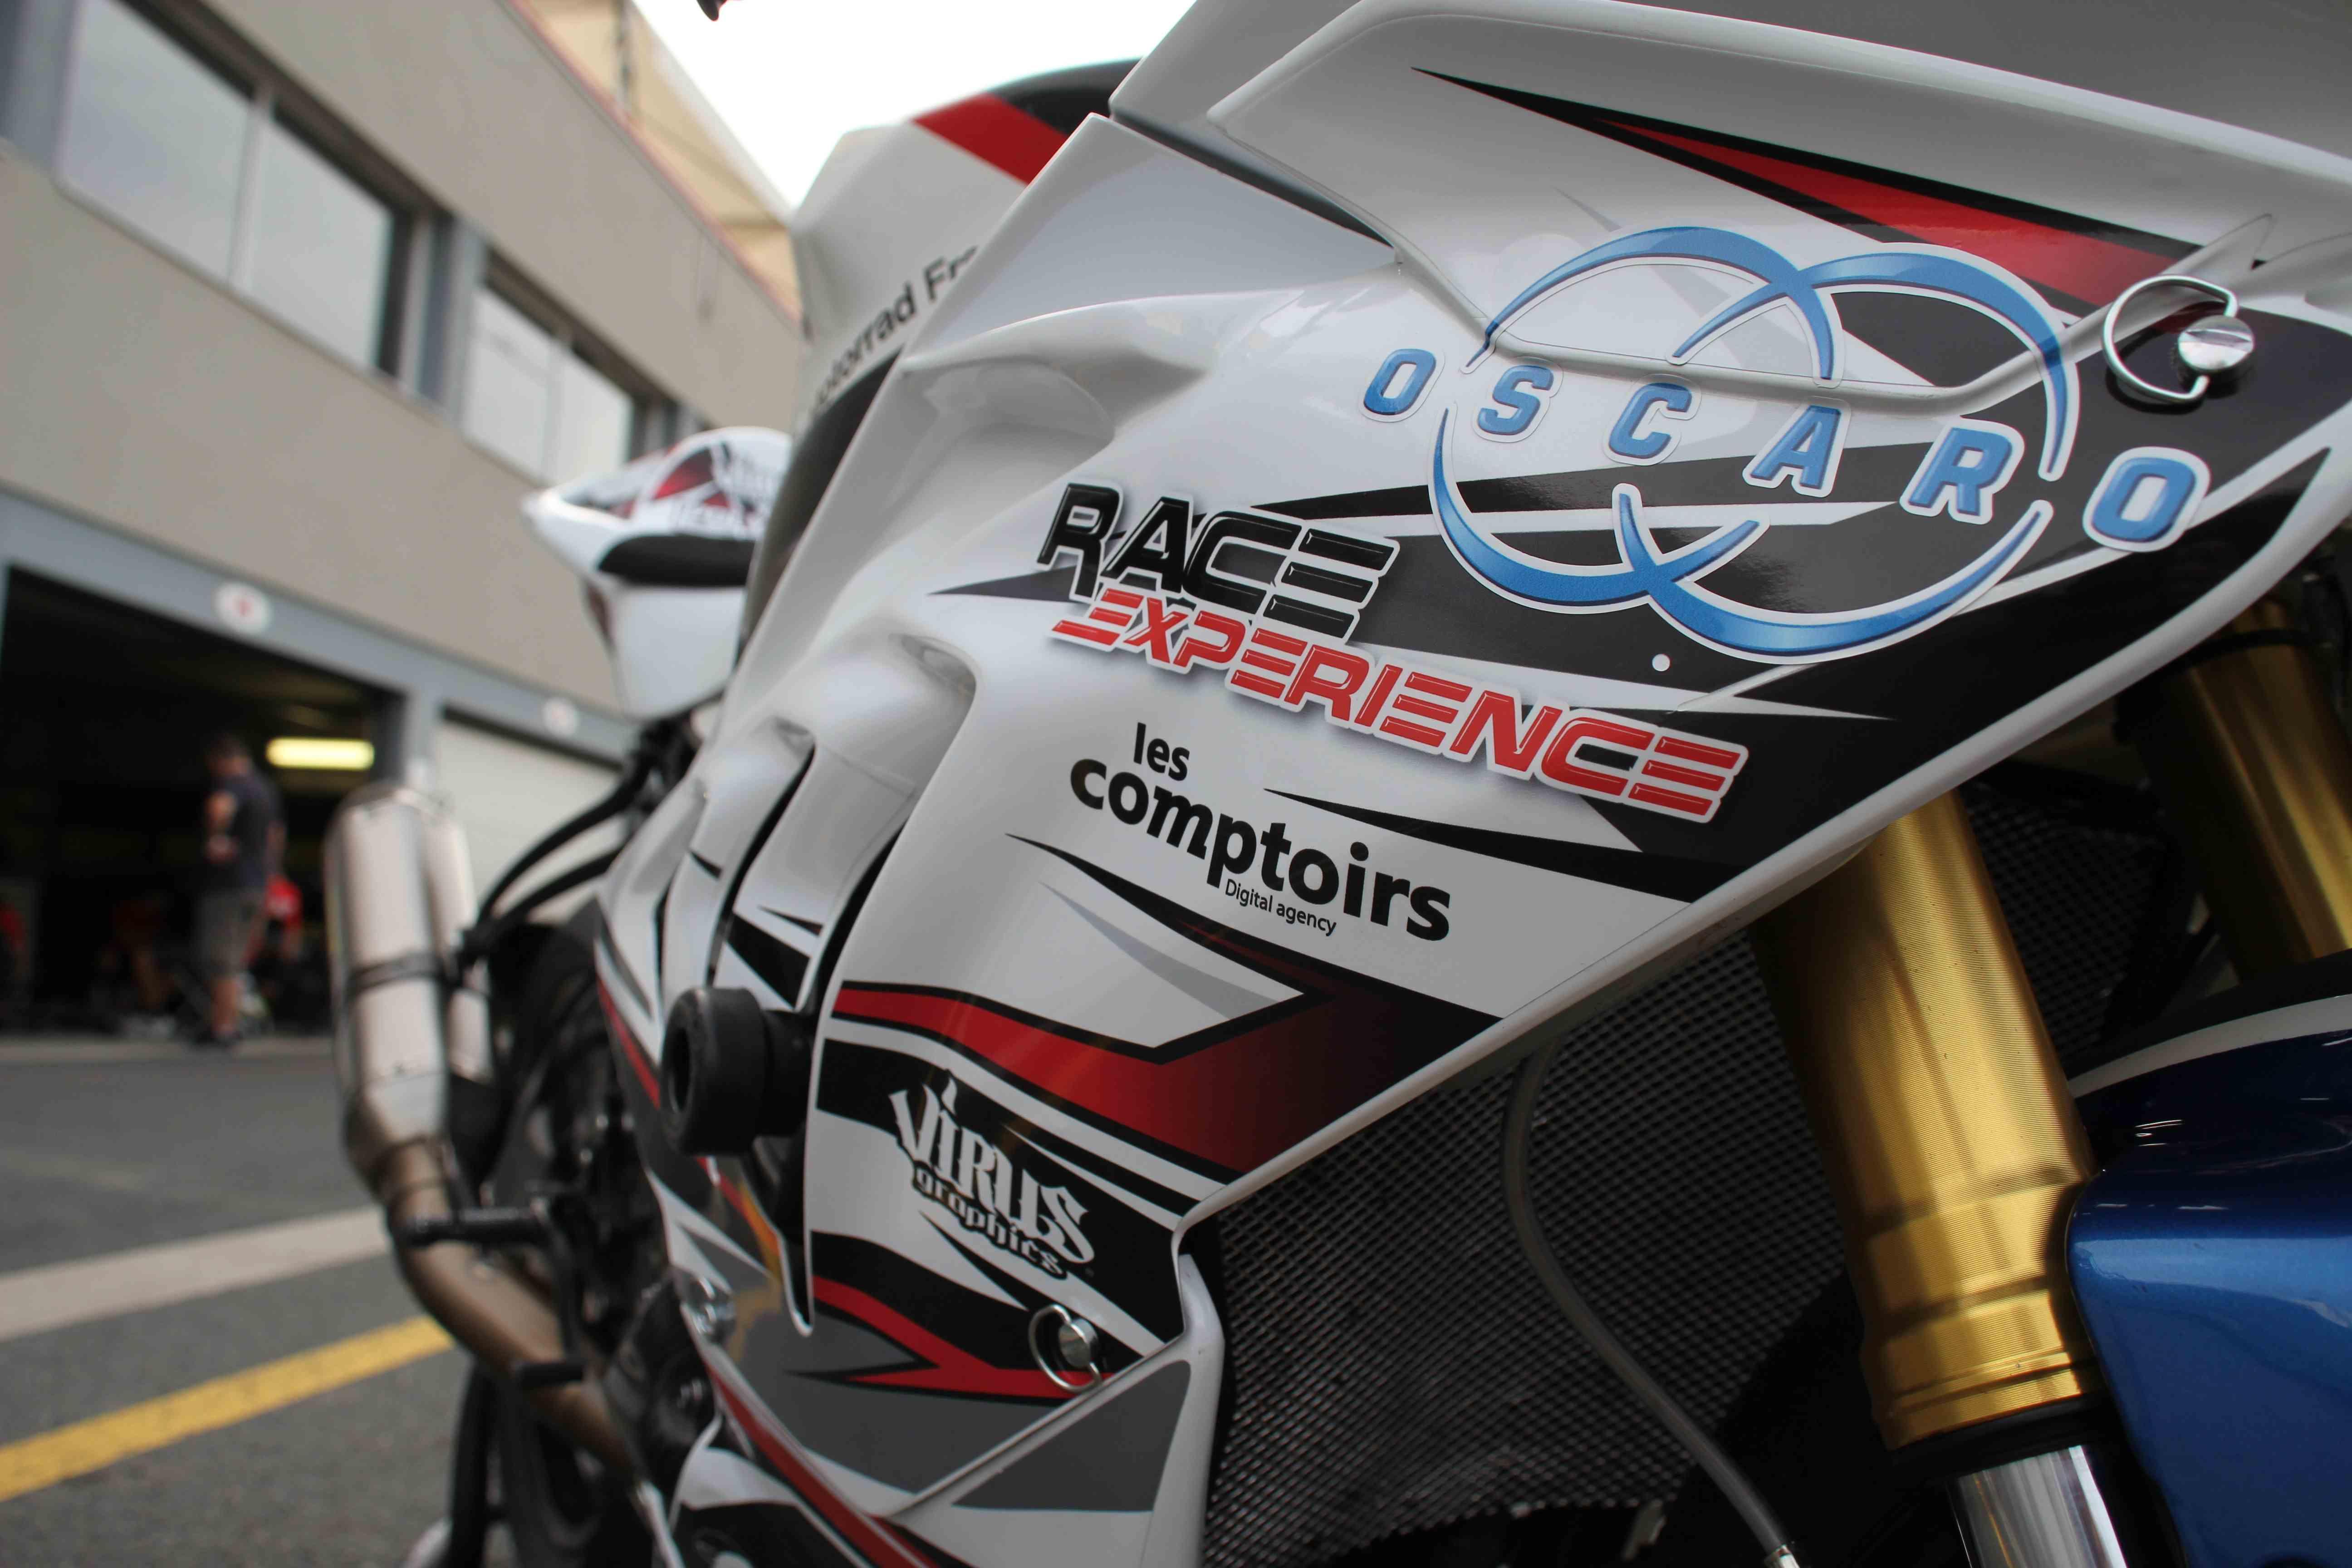 BMW Superbike 2013 - Race Experience-1